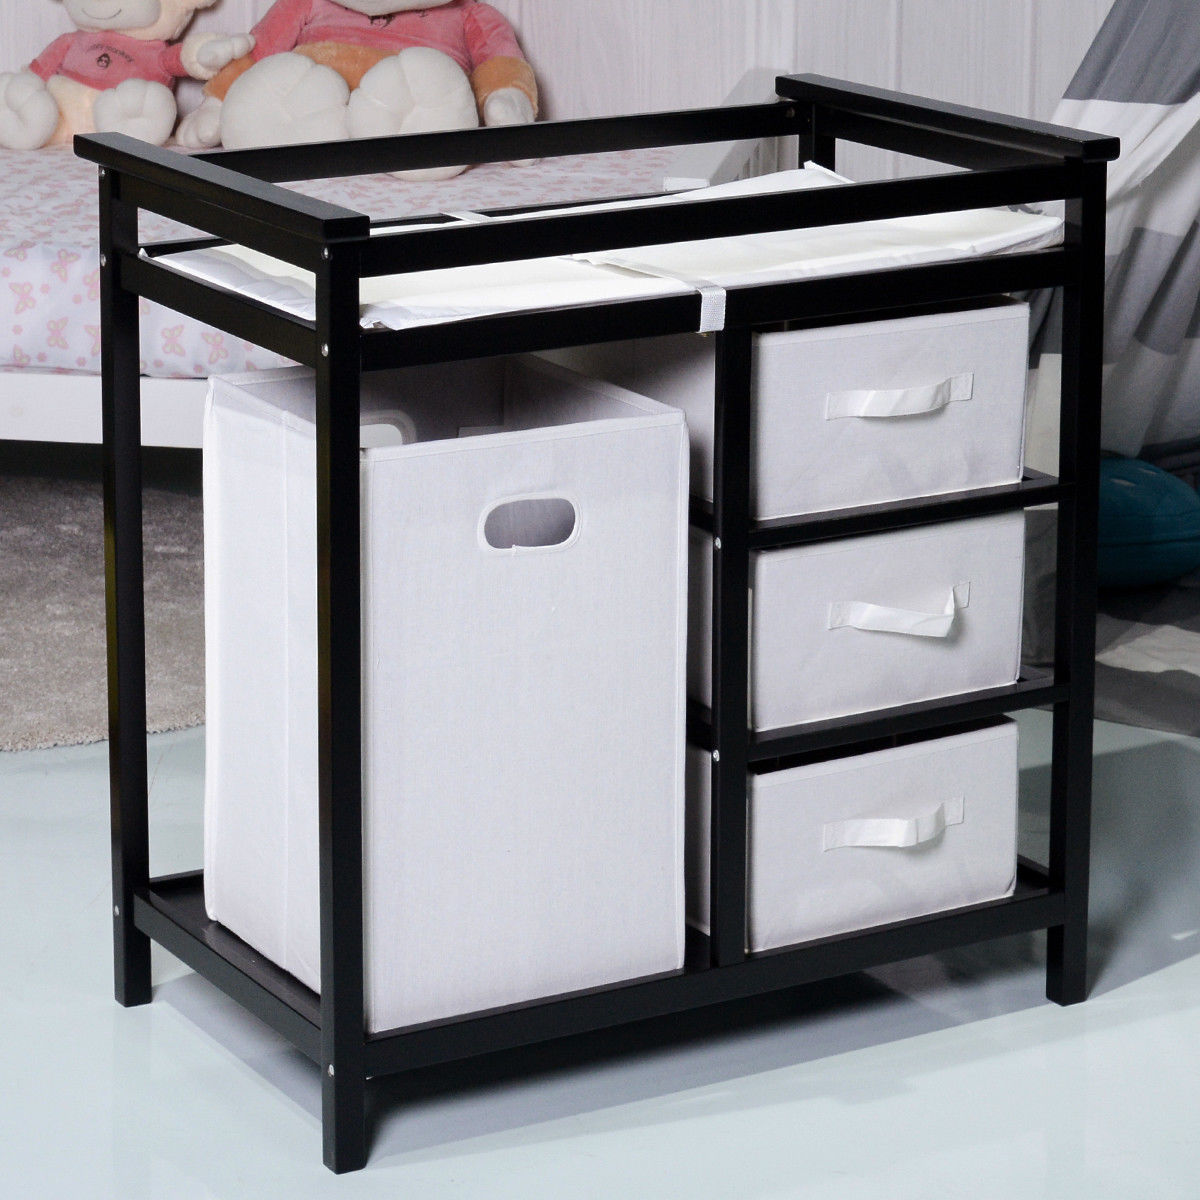 Costway Black Infant Baby Changing Table w/3 Basket Hamper Diaper Storage Nursery